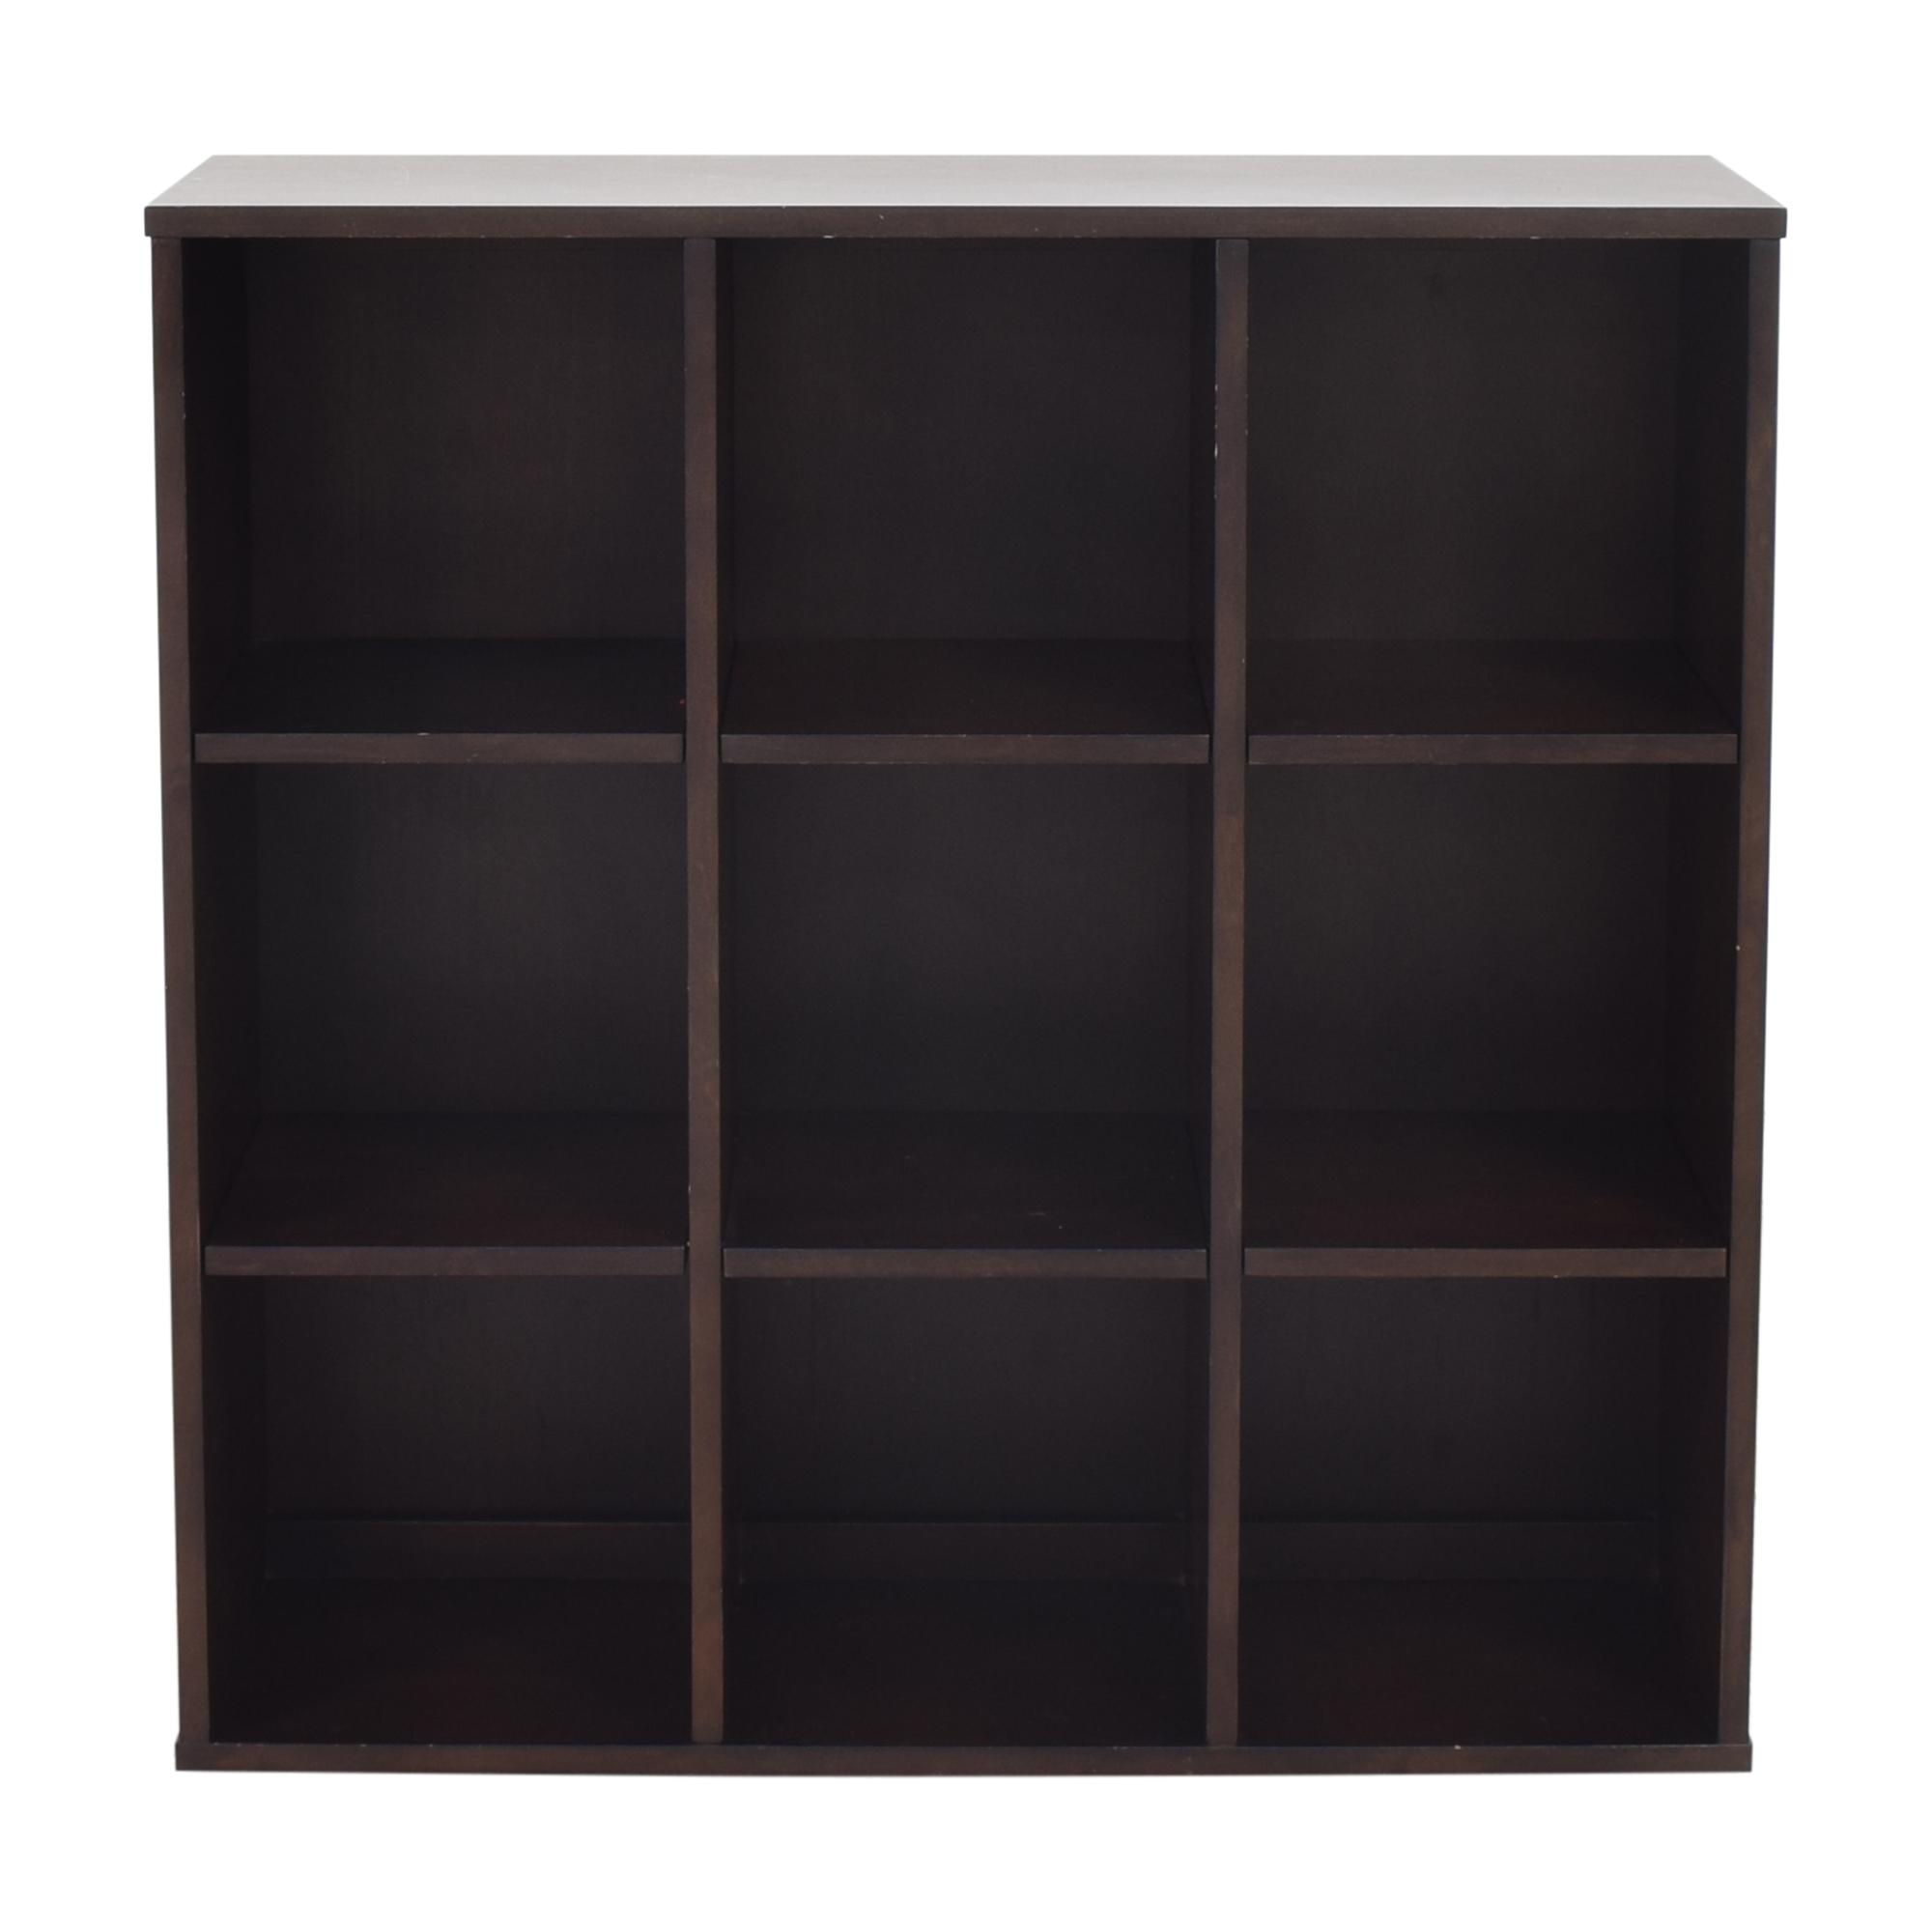 Custom Cubby Shelf